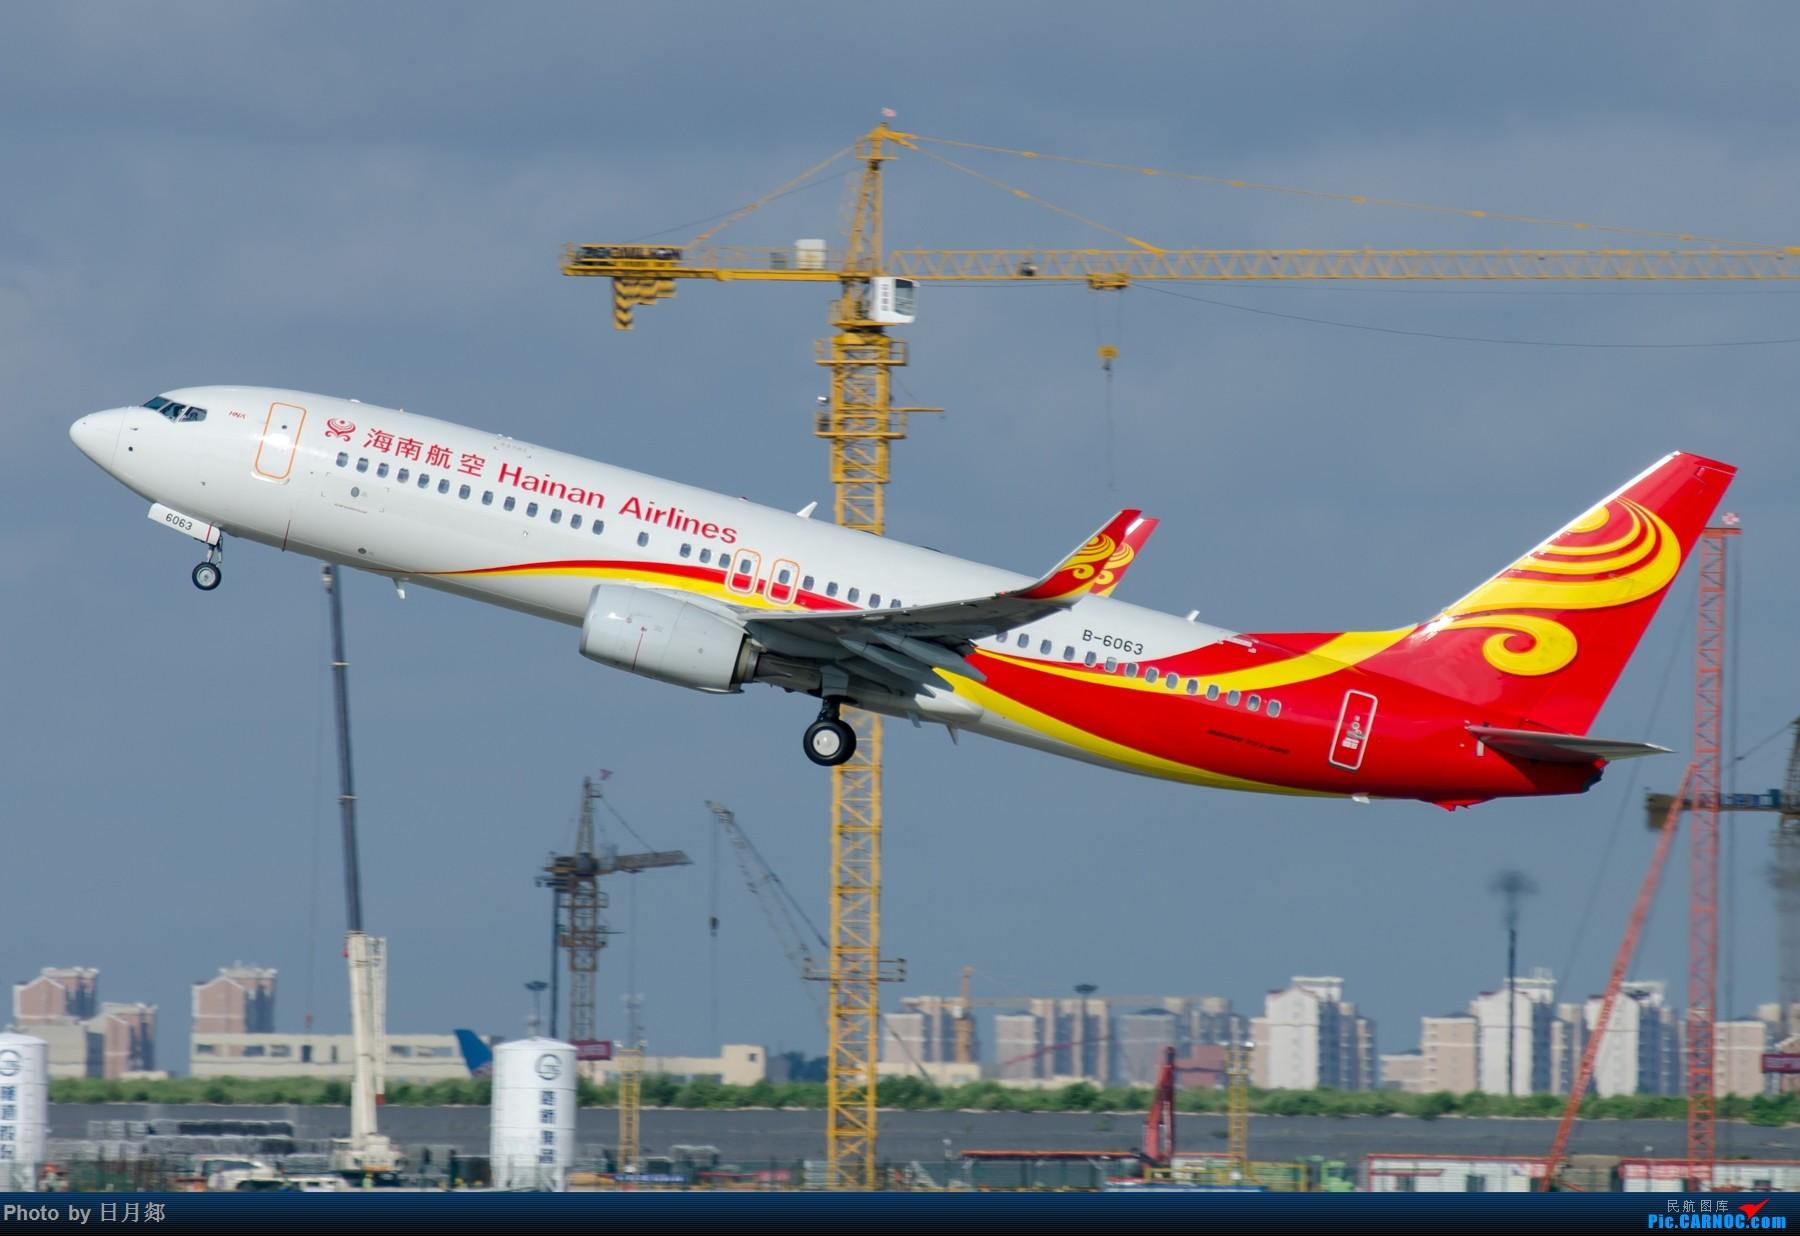 Re:[原创]一年起的最早的一次,PVG撒欢! BOEING 737-800 B-6063 中国上海浦东国际机场